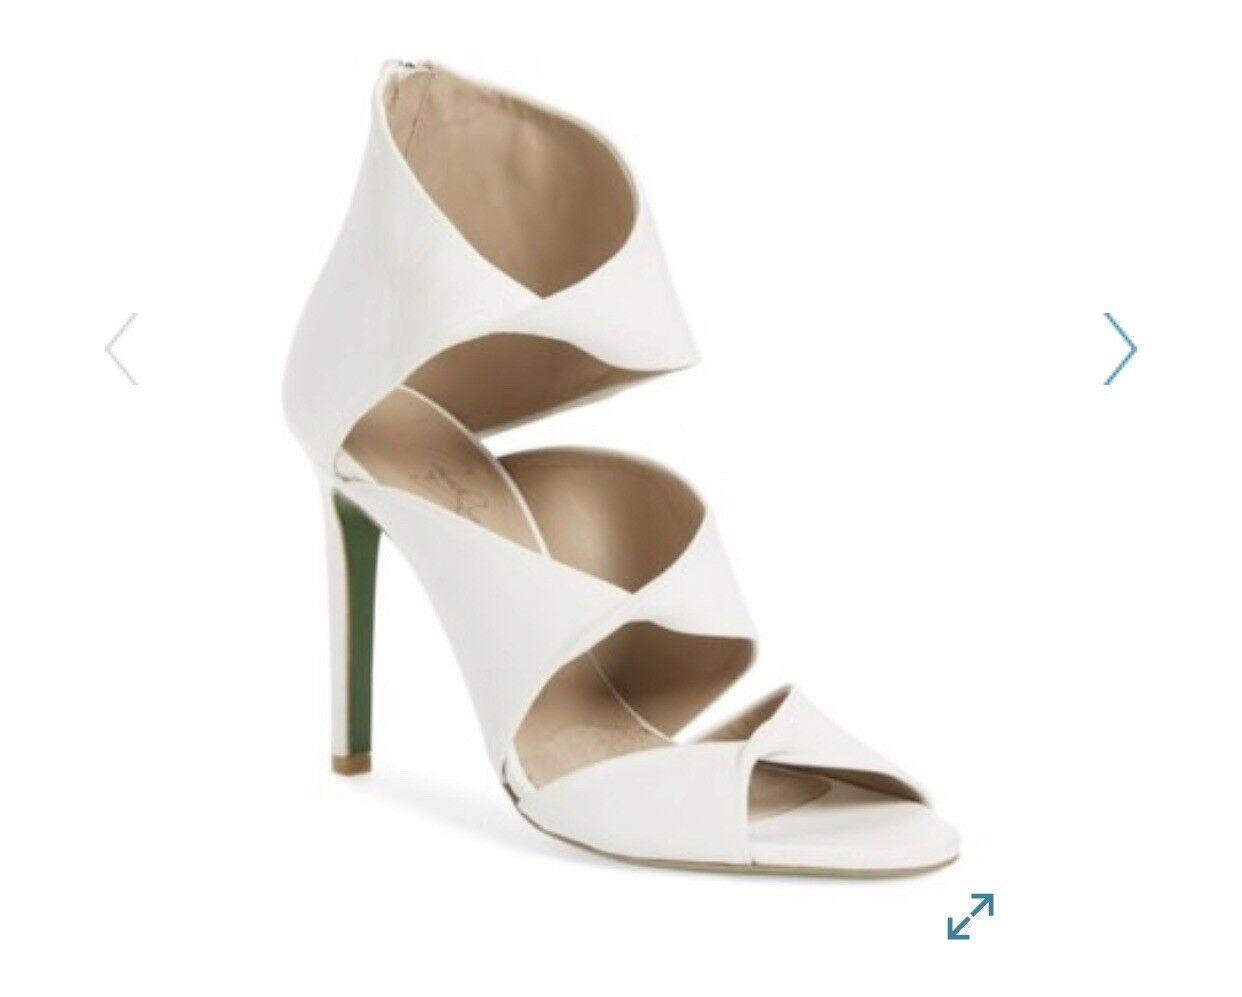 Donald J pliner  bianca IKAYA - SIGNATURA Nappa Leather Heeled Sandal SZ 7.5  395  negozi al dettaglio